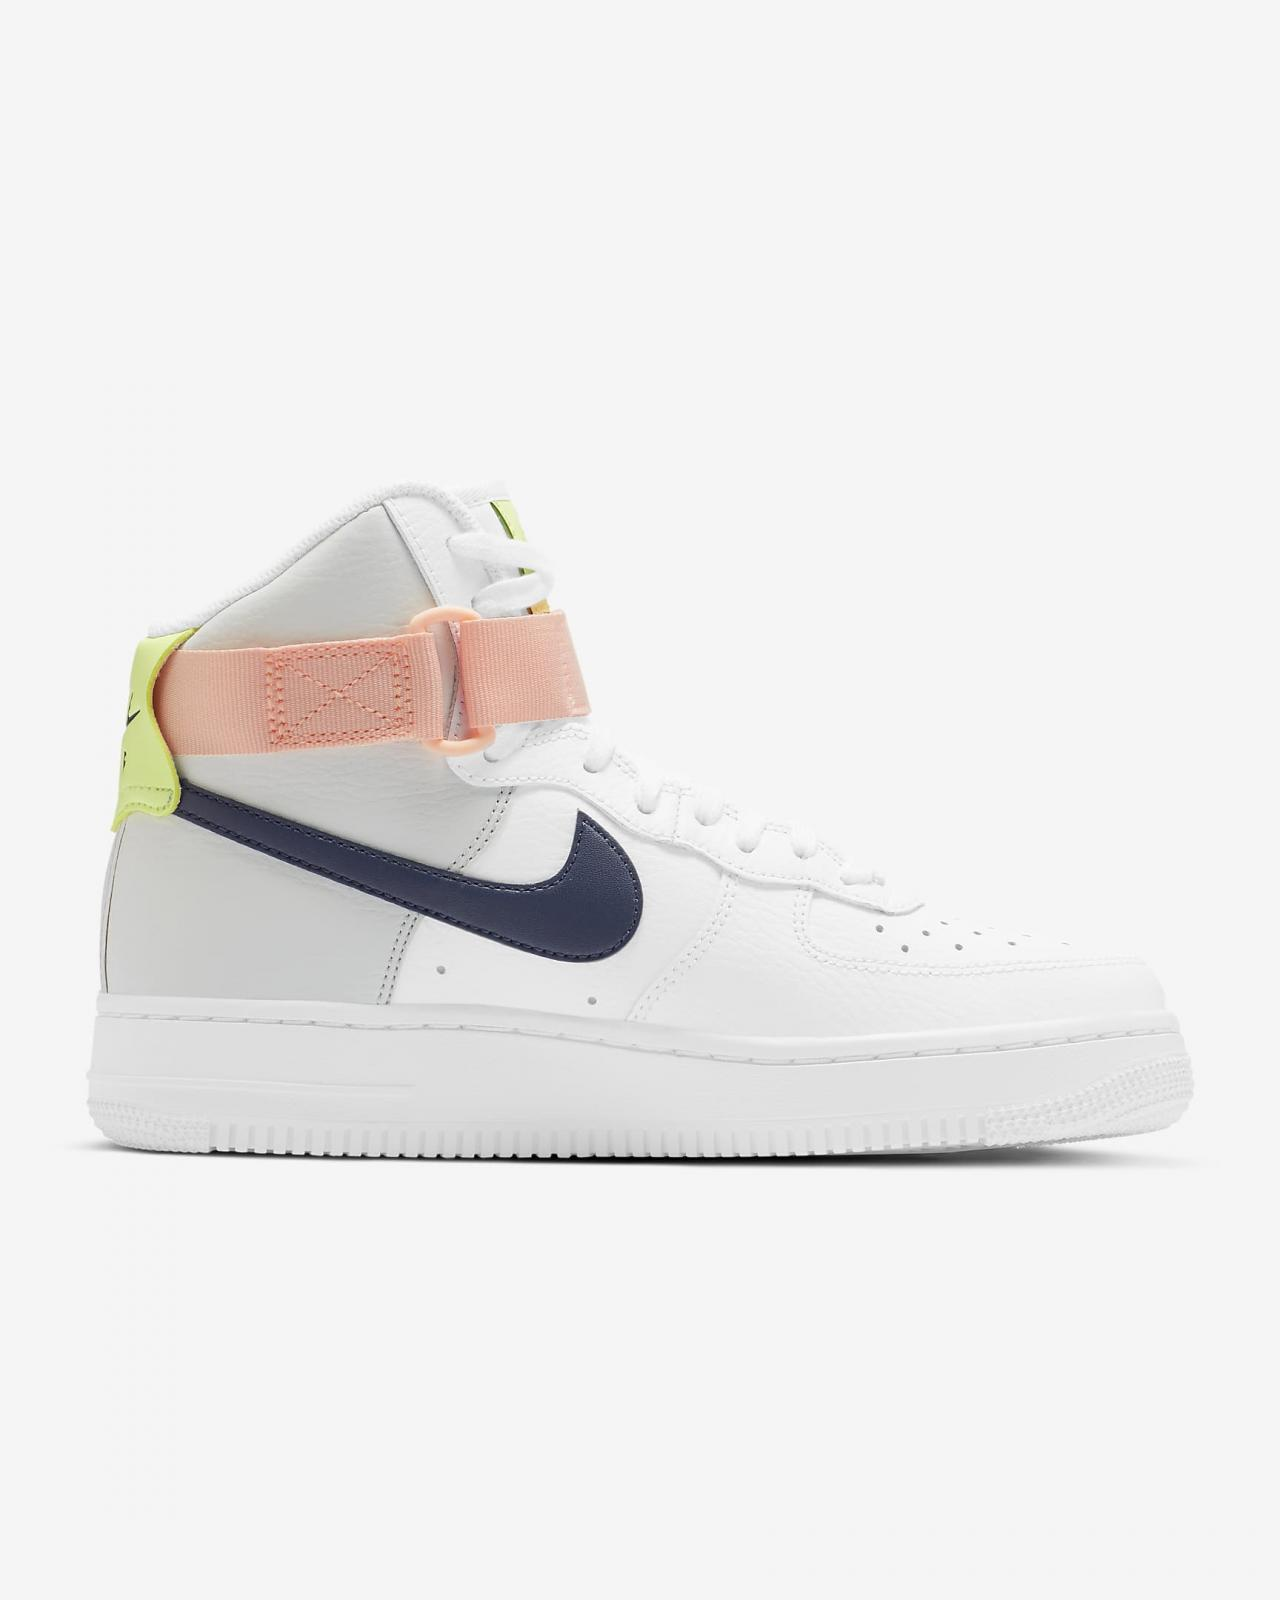 Nike Sportswear推出全新白/光子灰/微黄绿/深藏青色WMNS Air Force 1 High